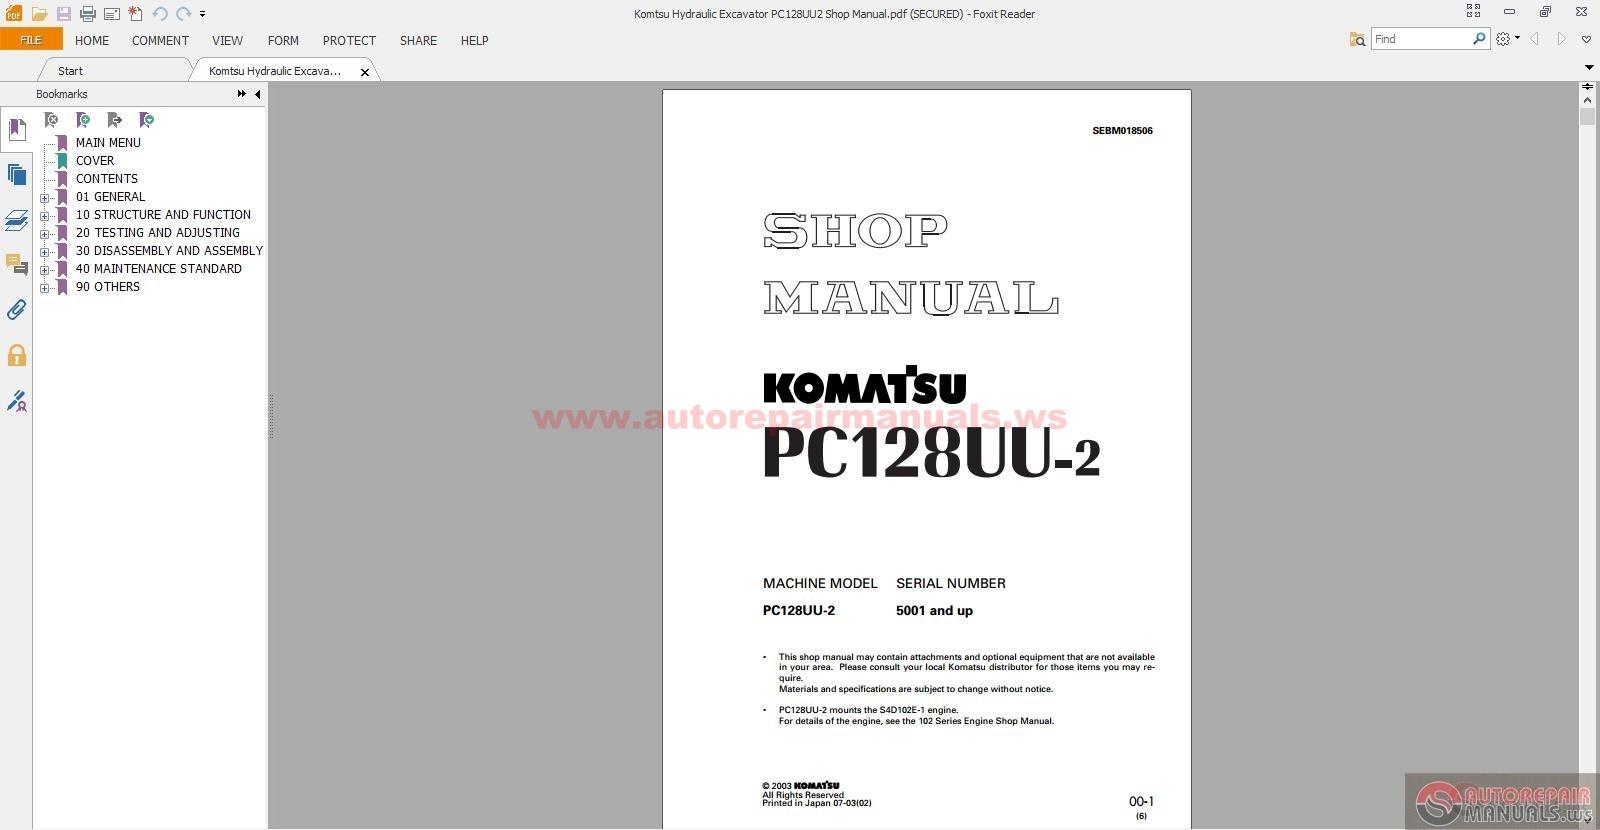 komatsu hydraulic excavator pc128uu2 shop manual auto. Black Bedroom Furniture Sets. Home Design Ideas